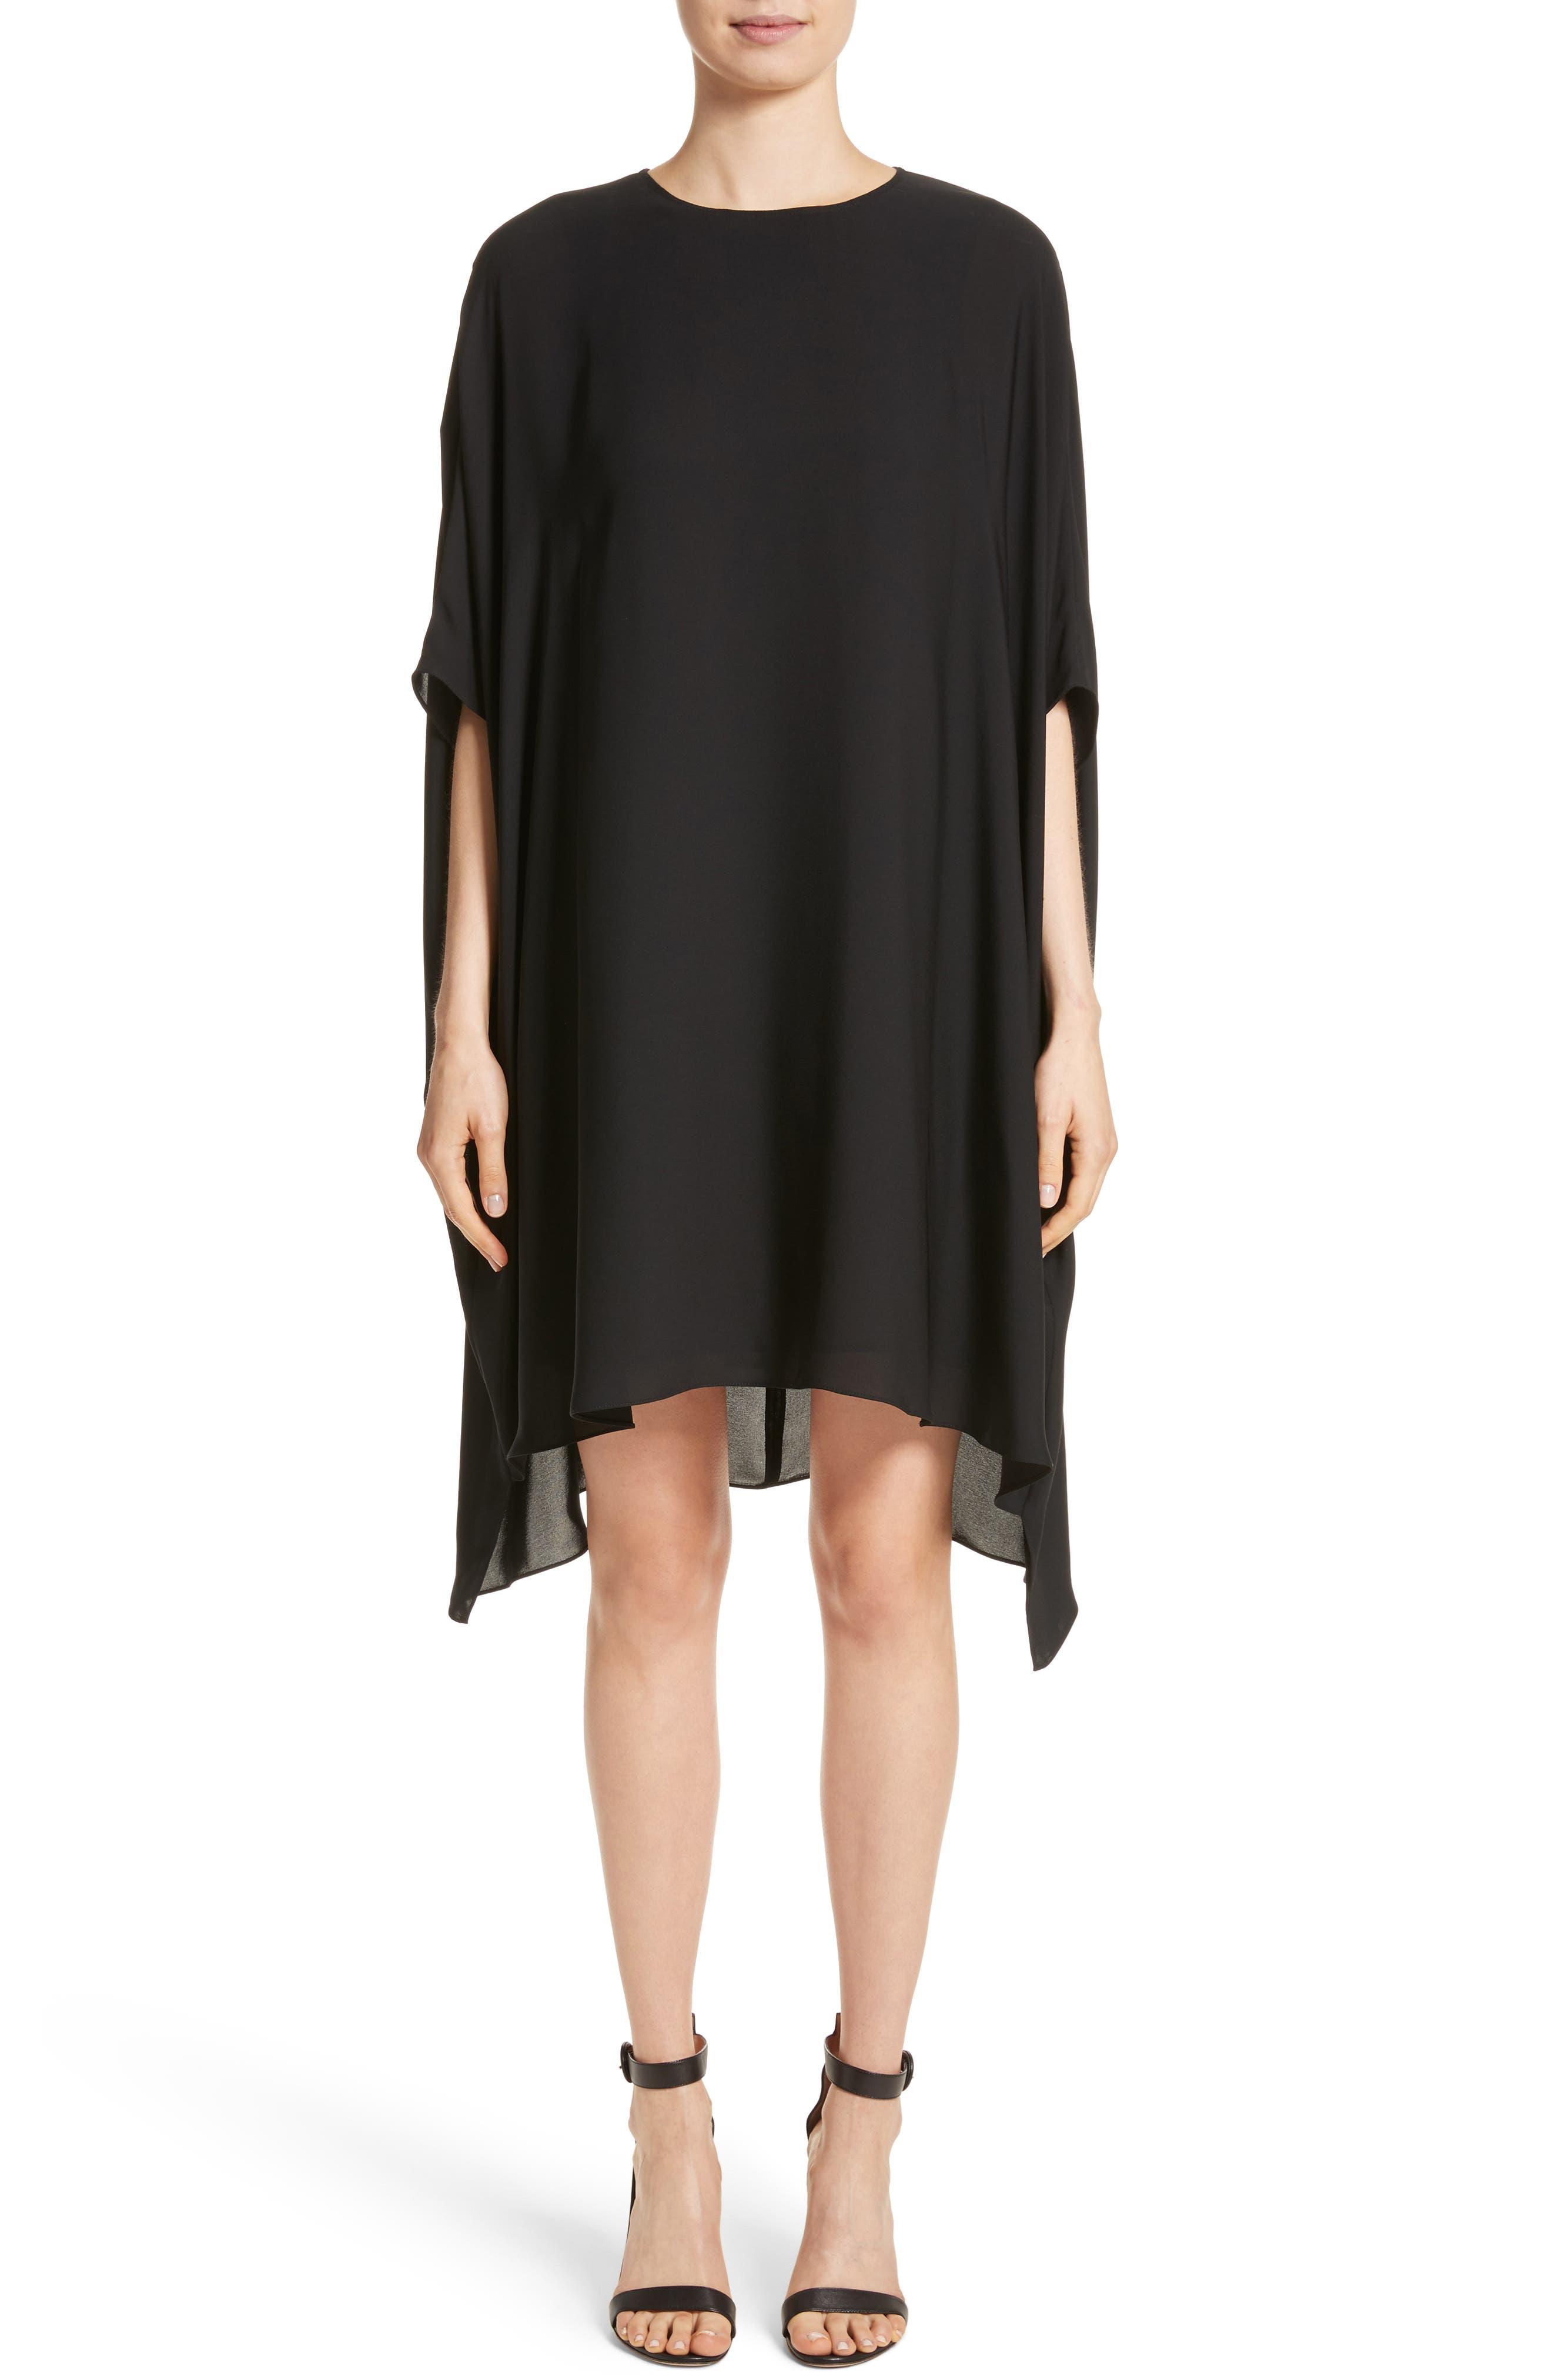 St. John Collection Double Silk Georgette Draped Dress, Size Petite - Black